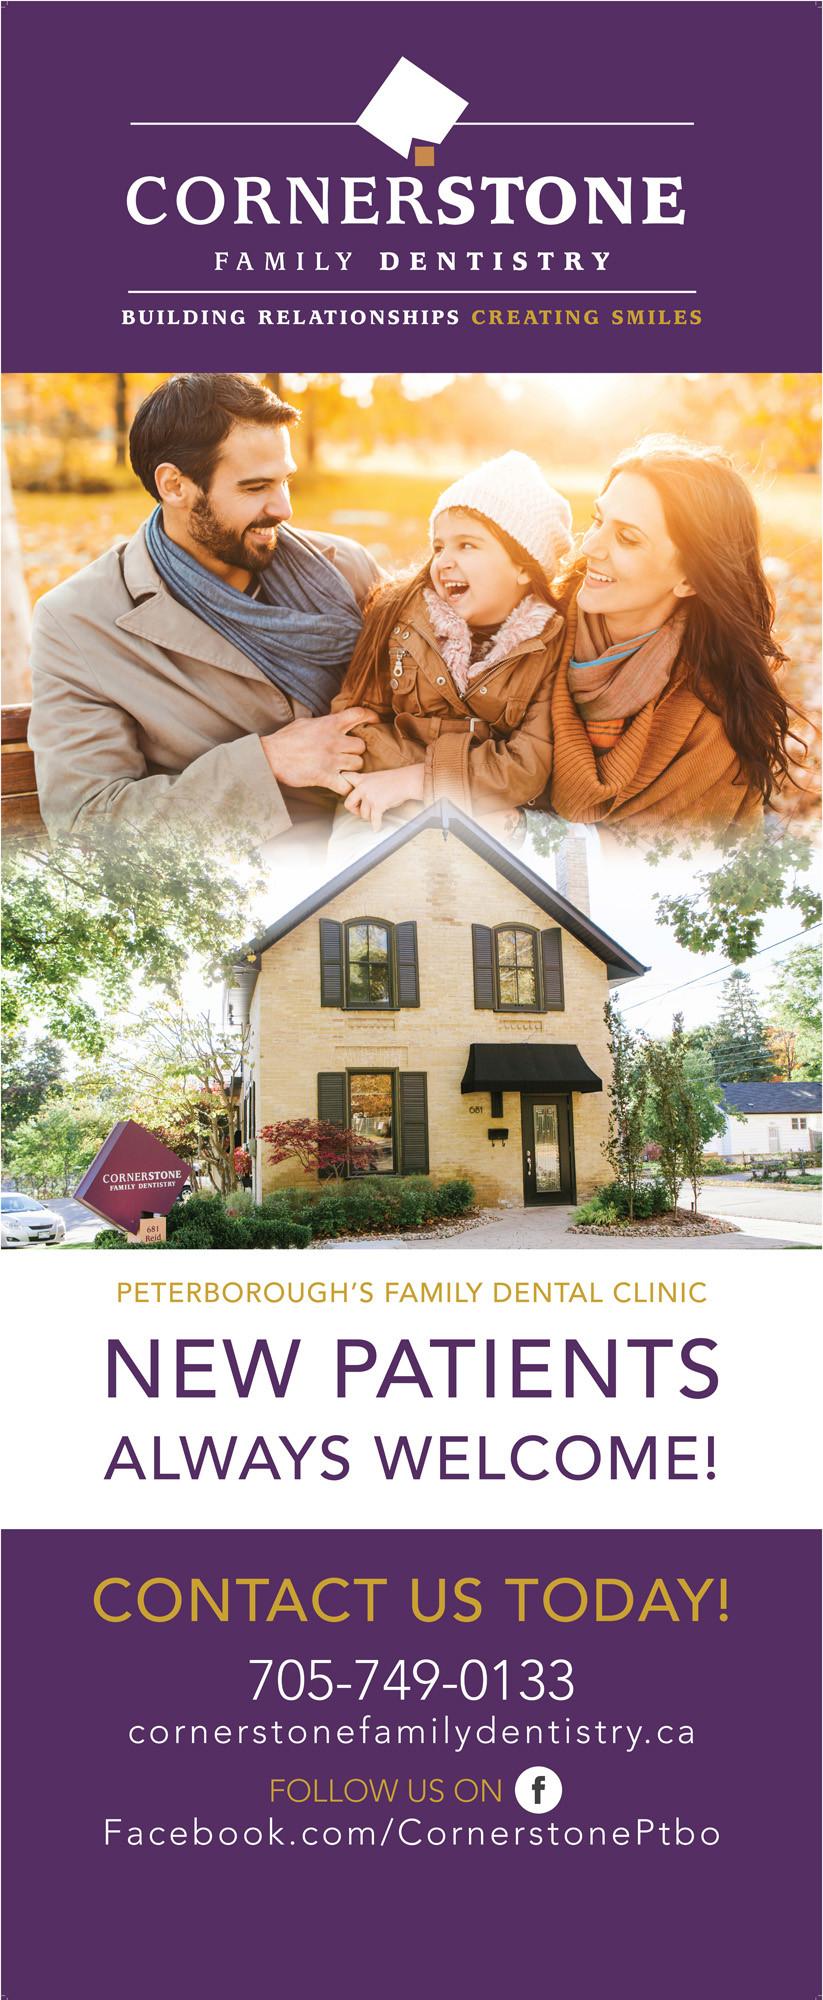 Cornerstone Family Dentistry Banner